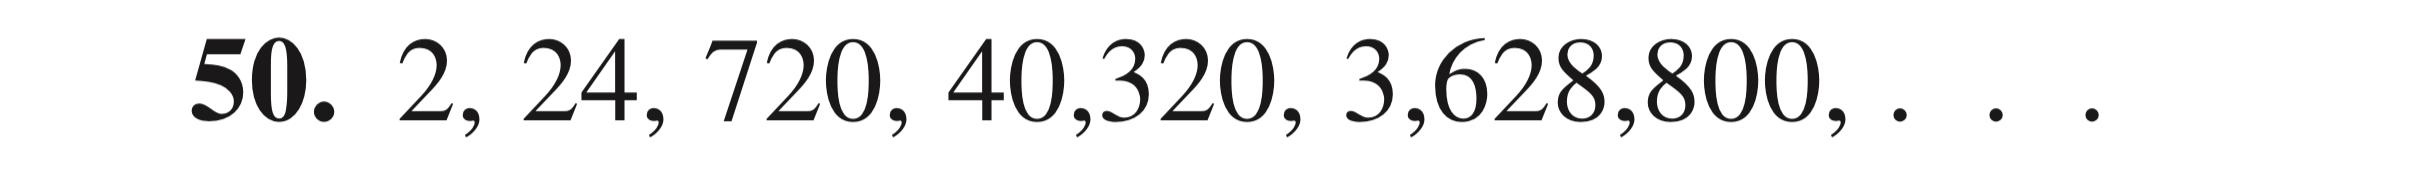 50. 2, 24, 720, 40,320, 3,628,800,